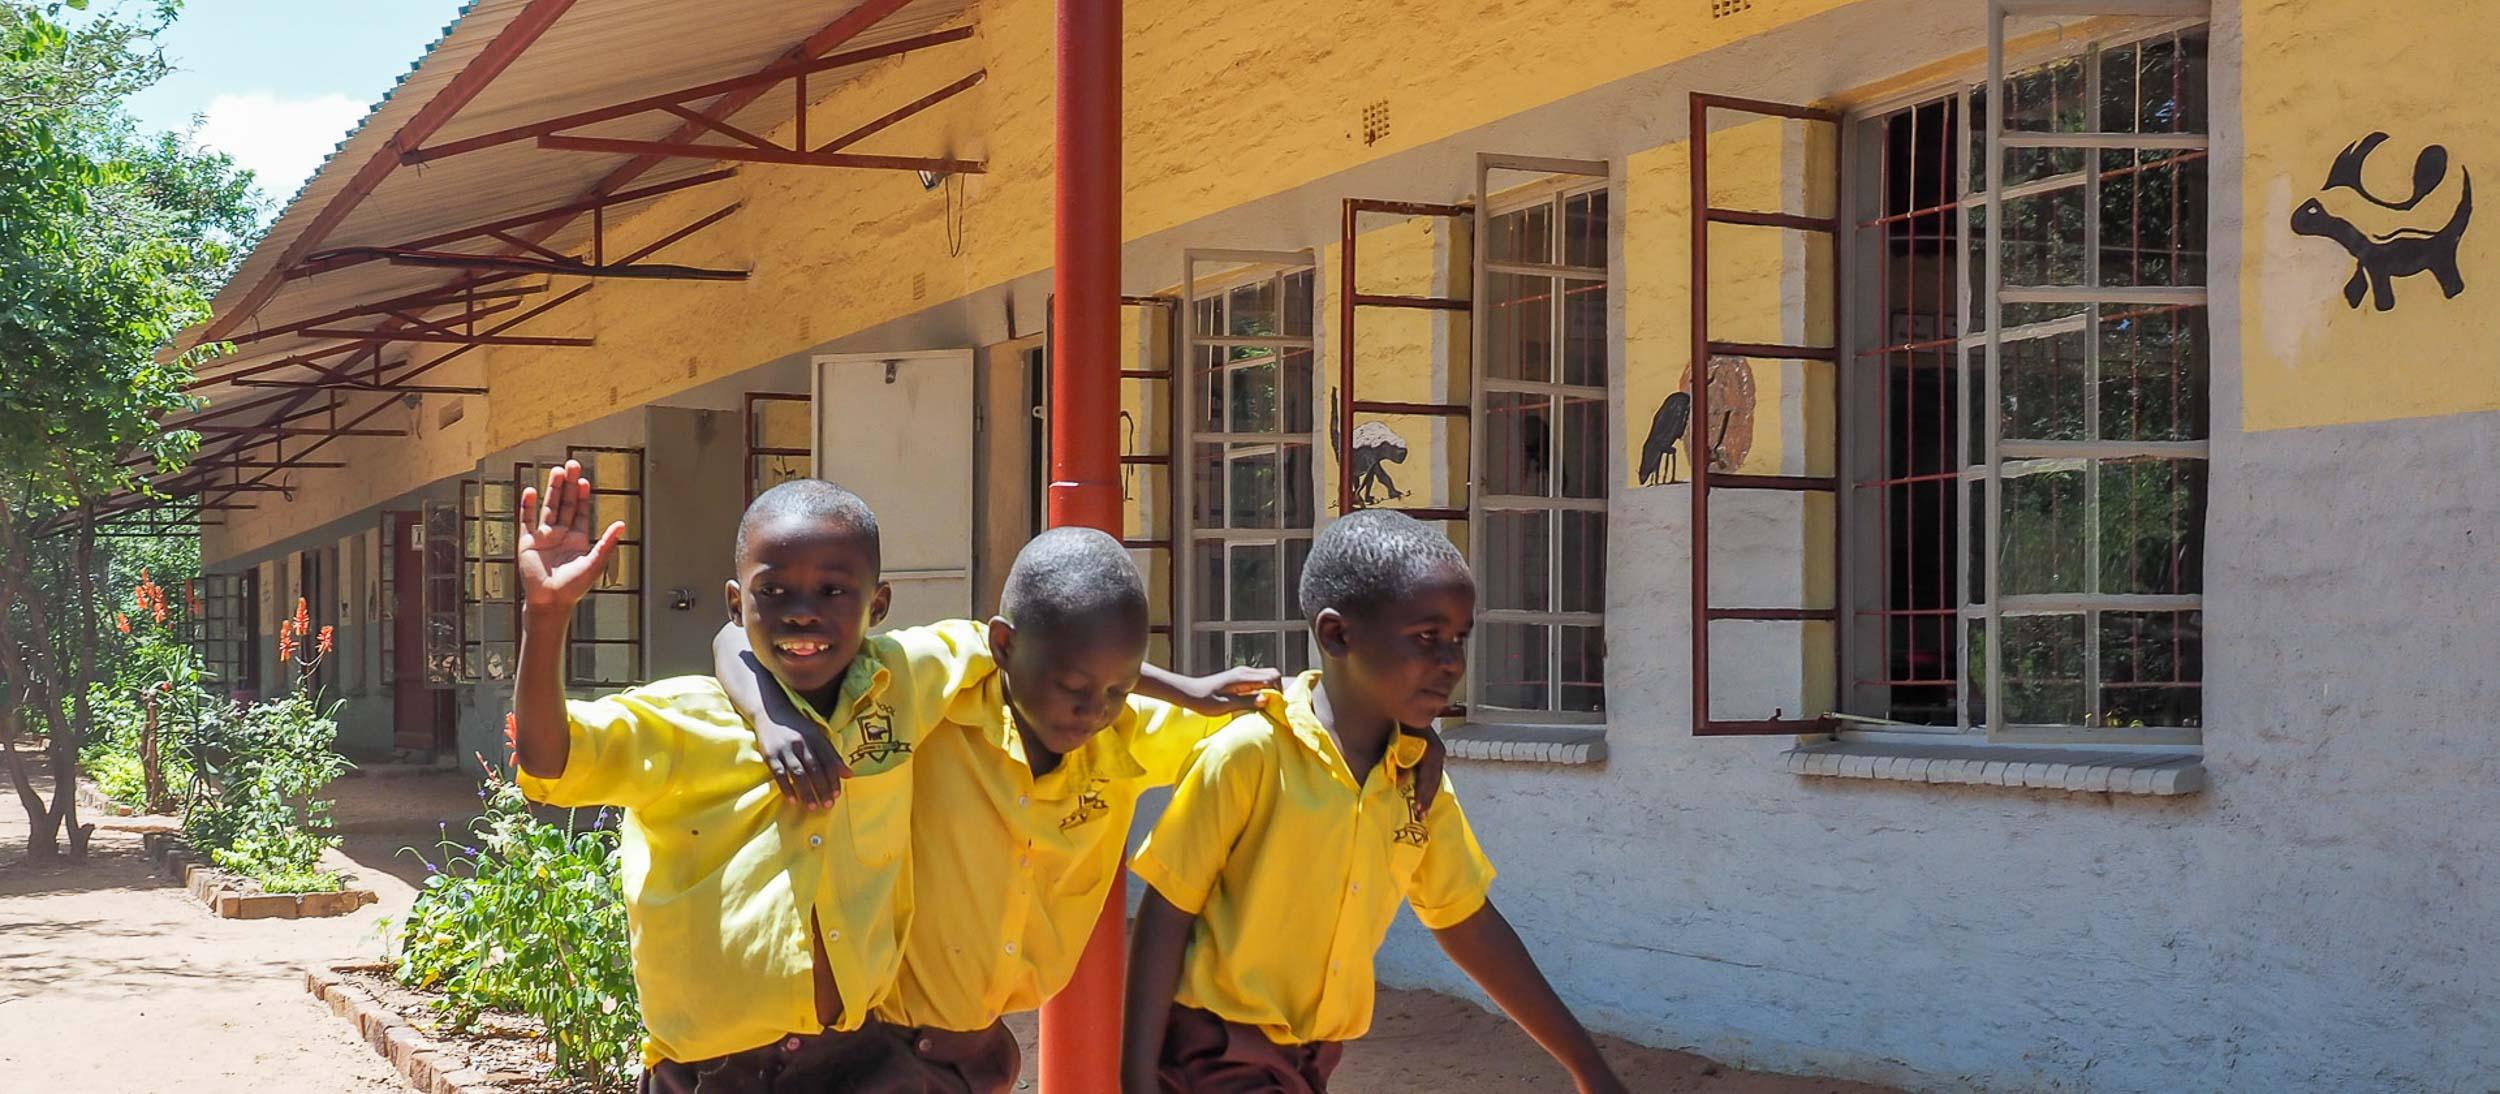 Lesedi School and Clinic